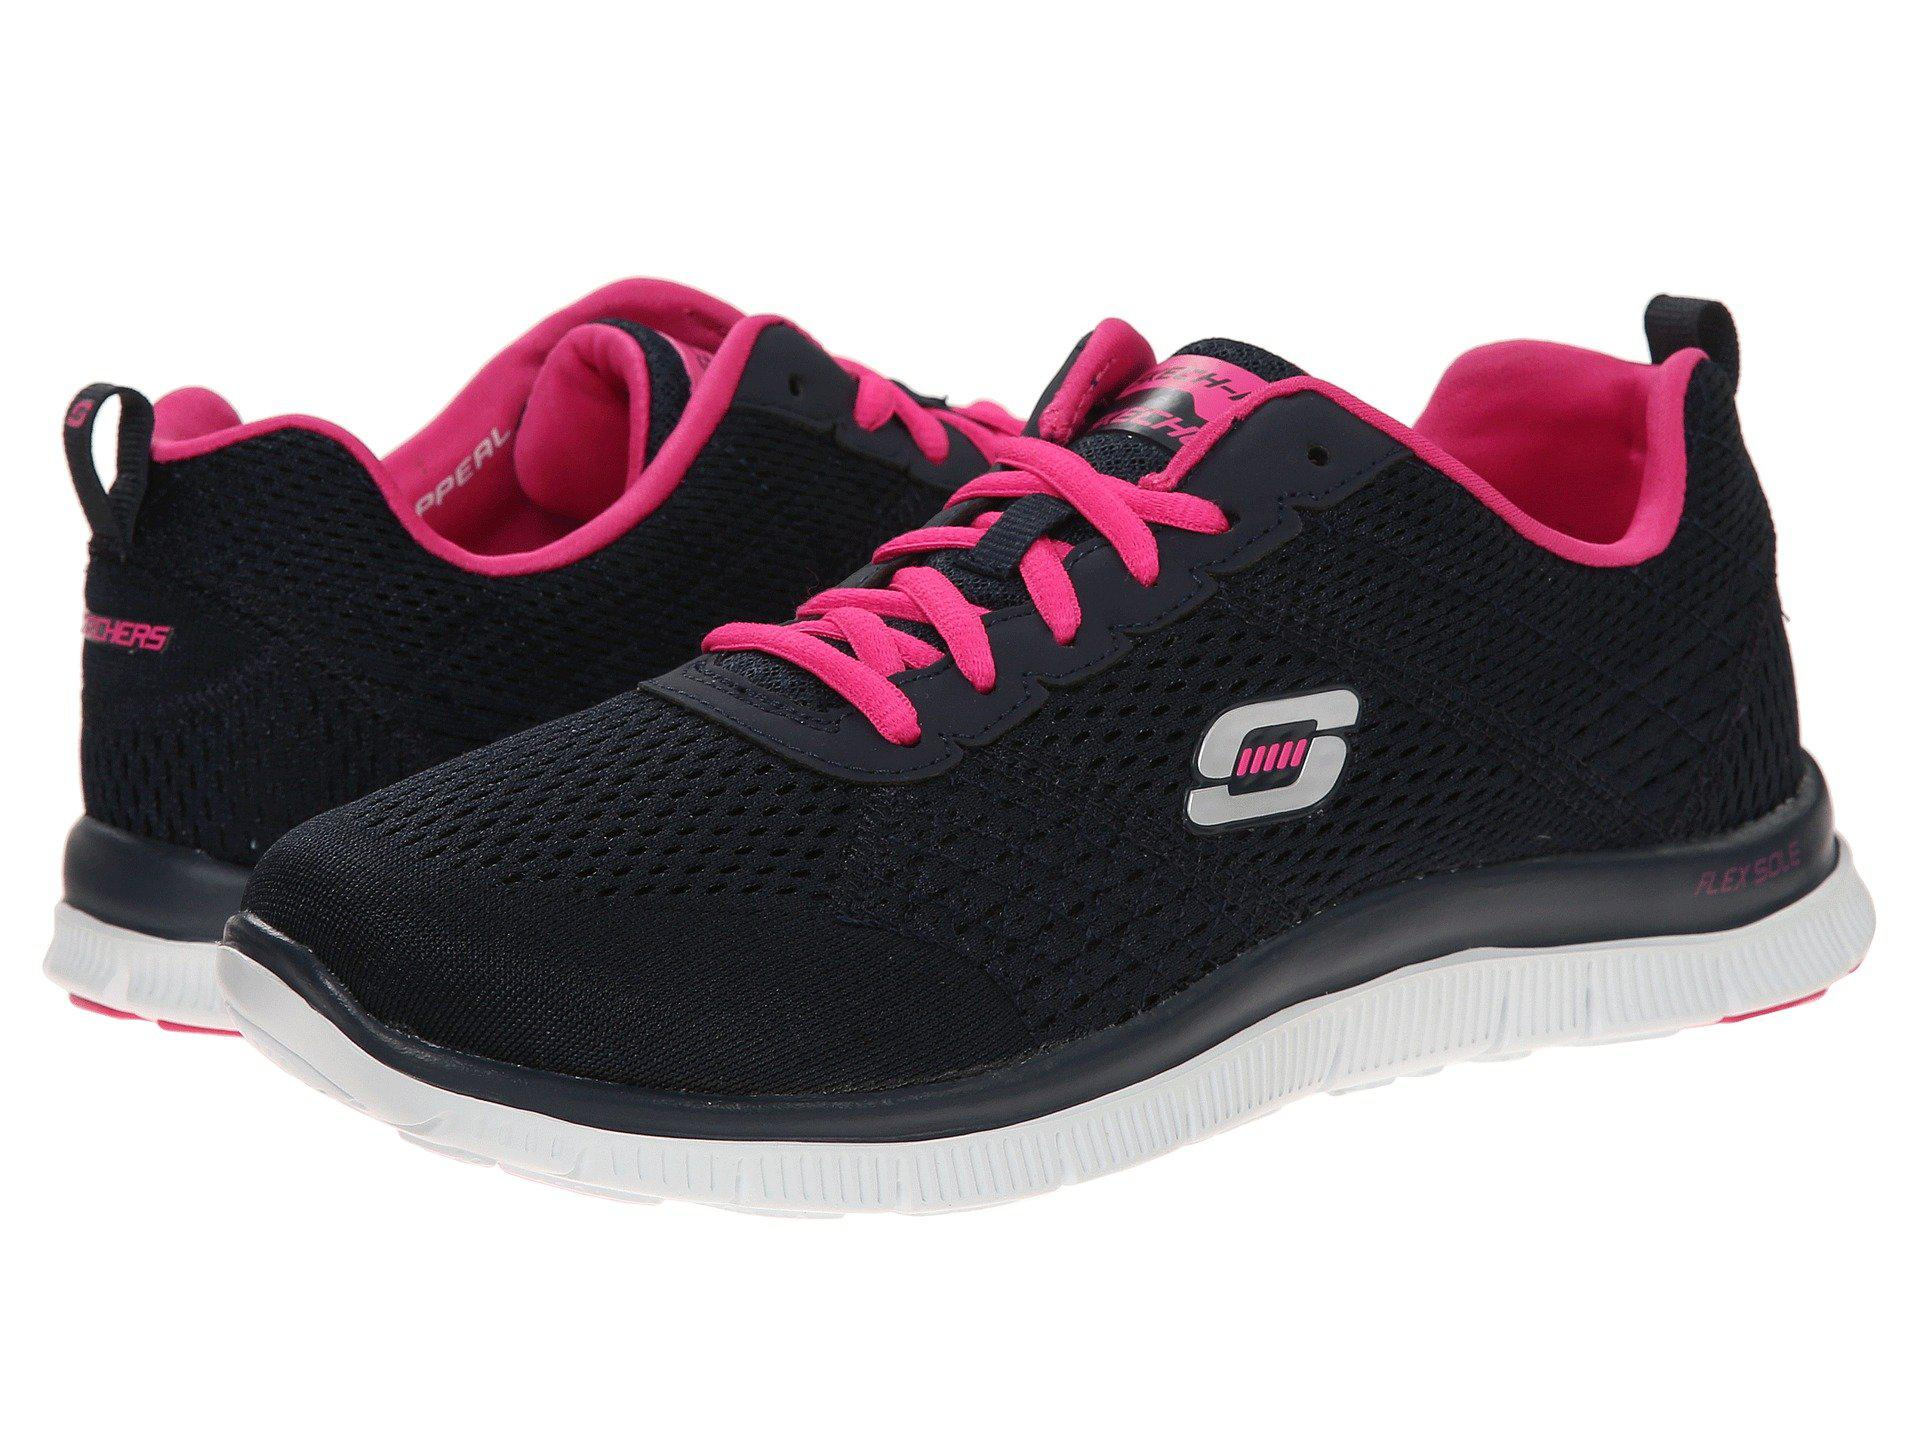 Skechers Flex Appeal Obvious Choice Women's Low Top Sneakers